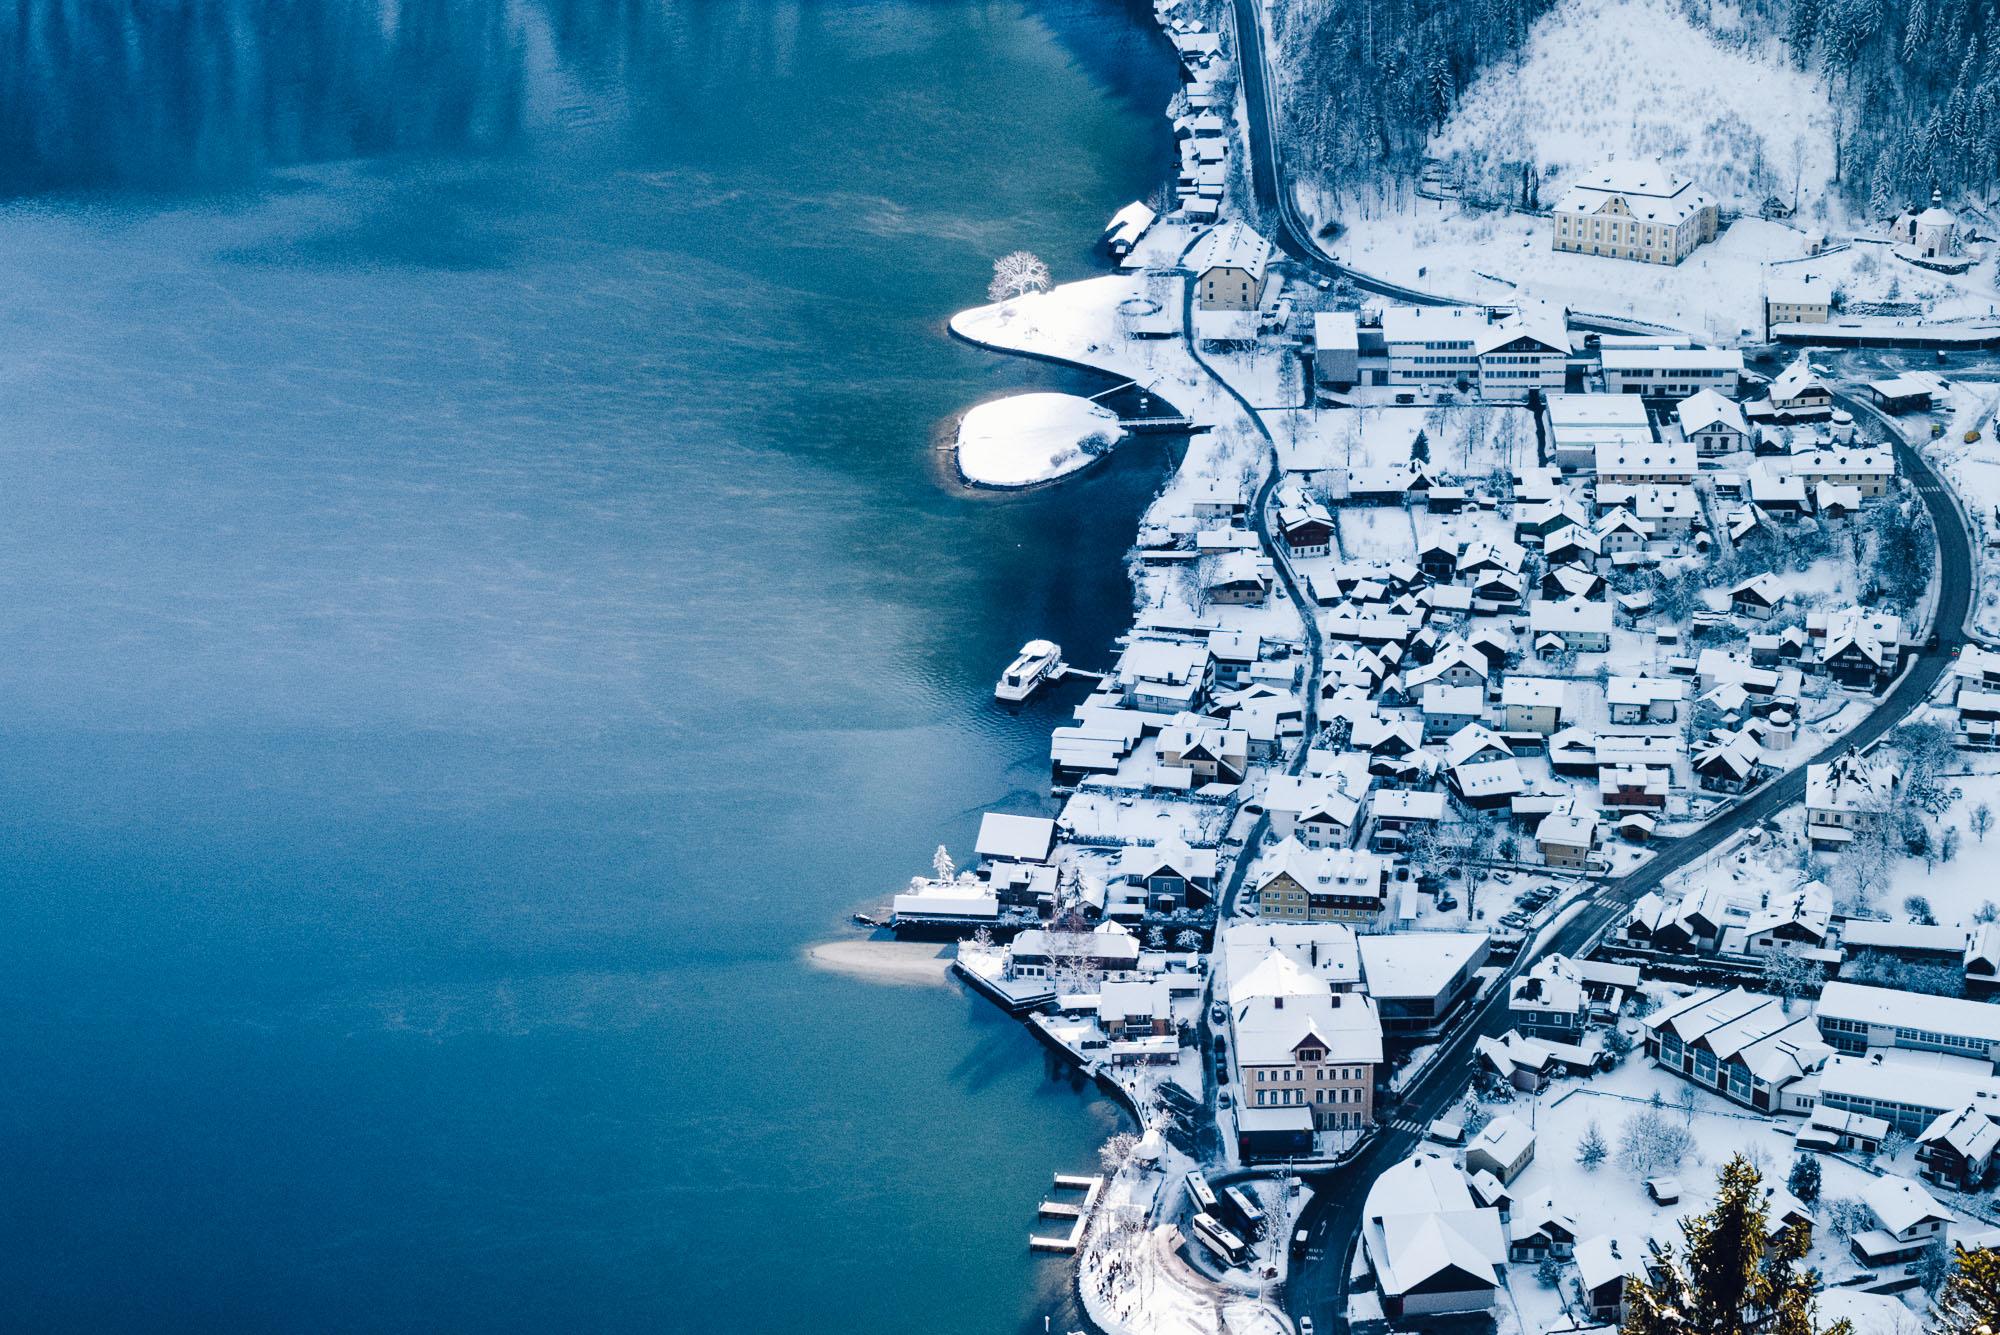 View from Hallstatt skywalk in winter World Heritage viewpoint